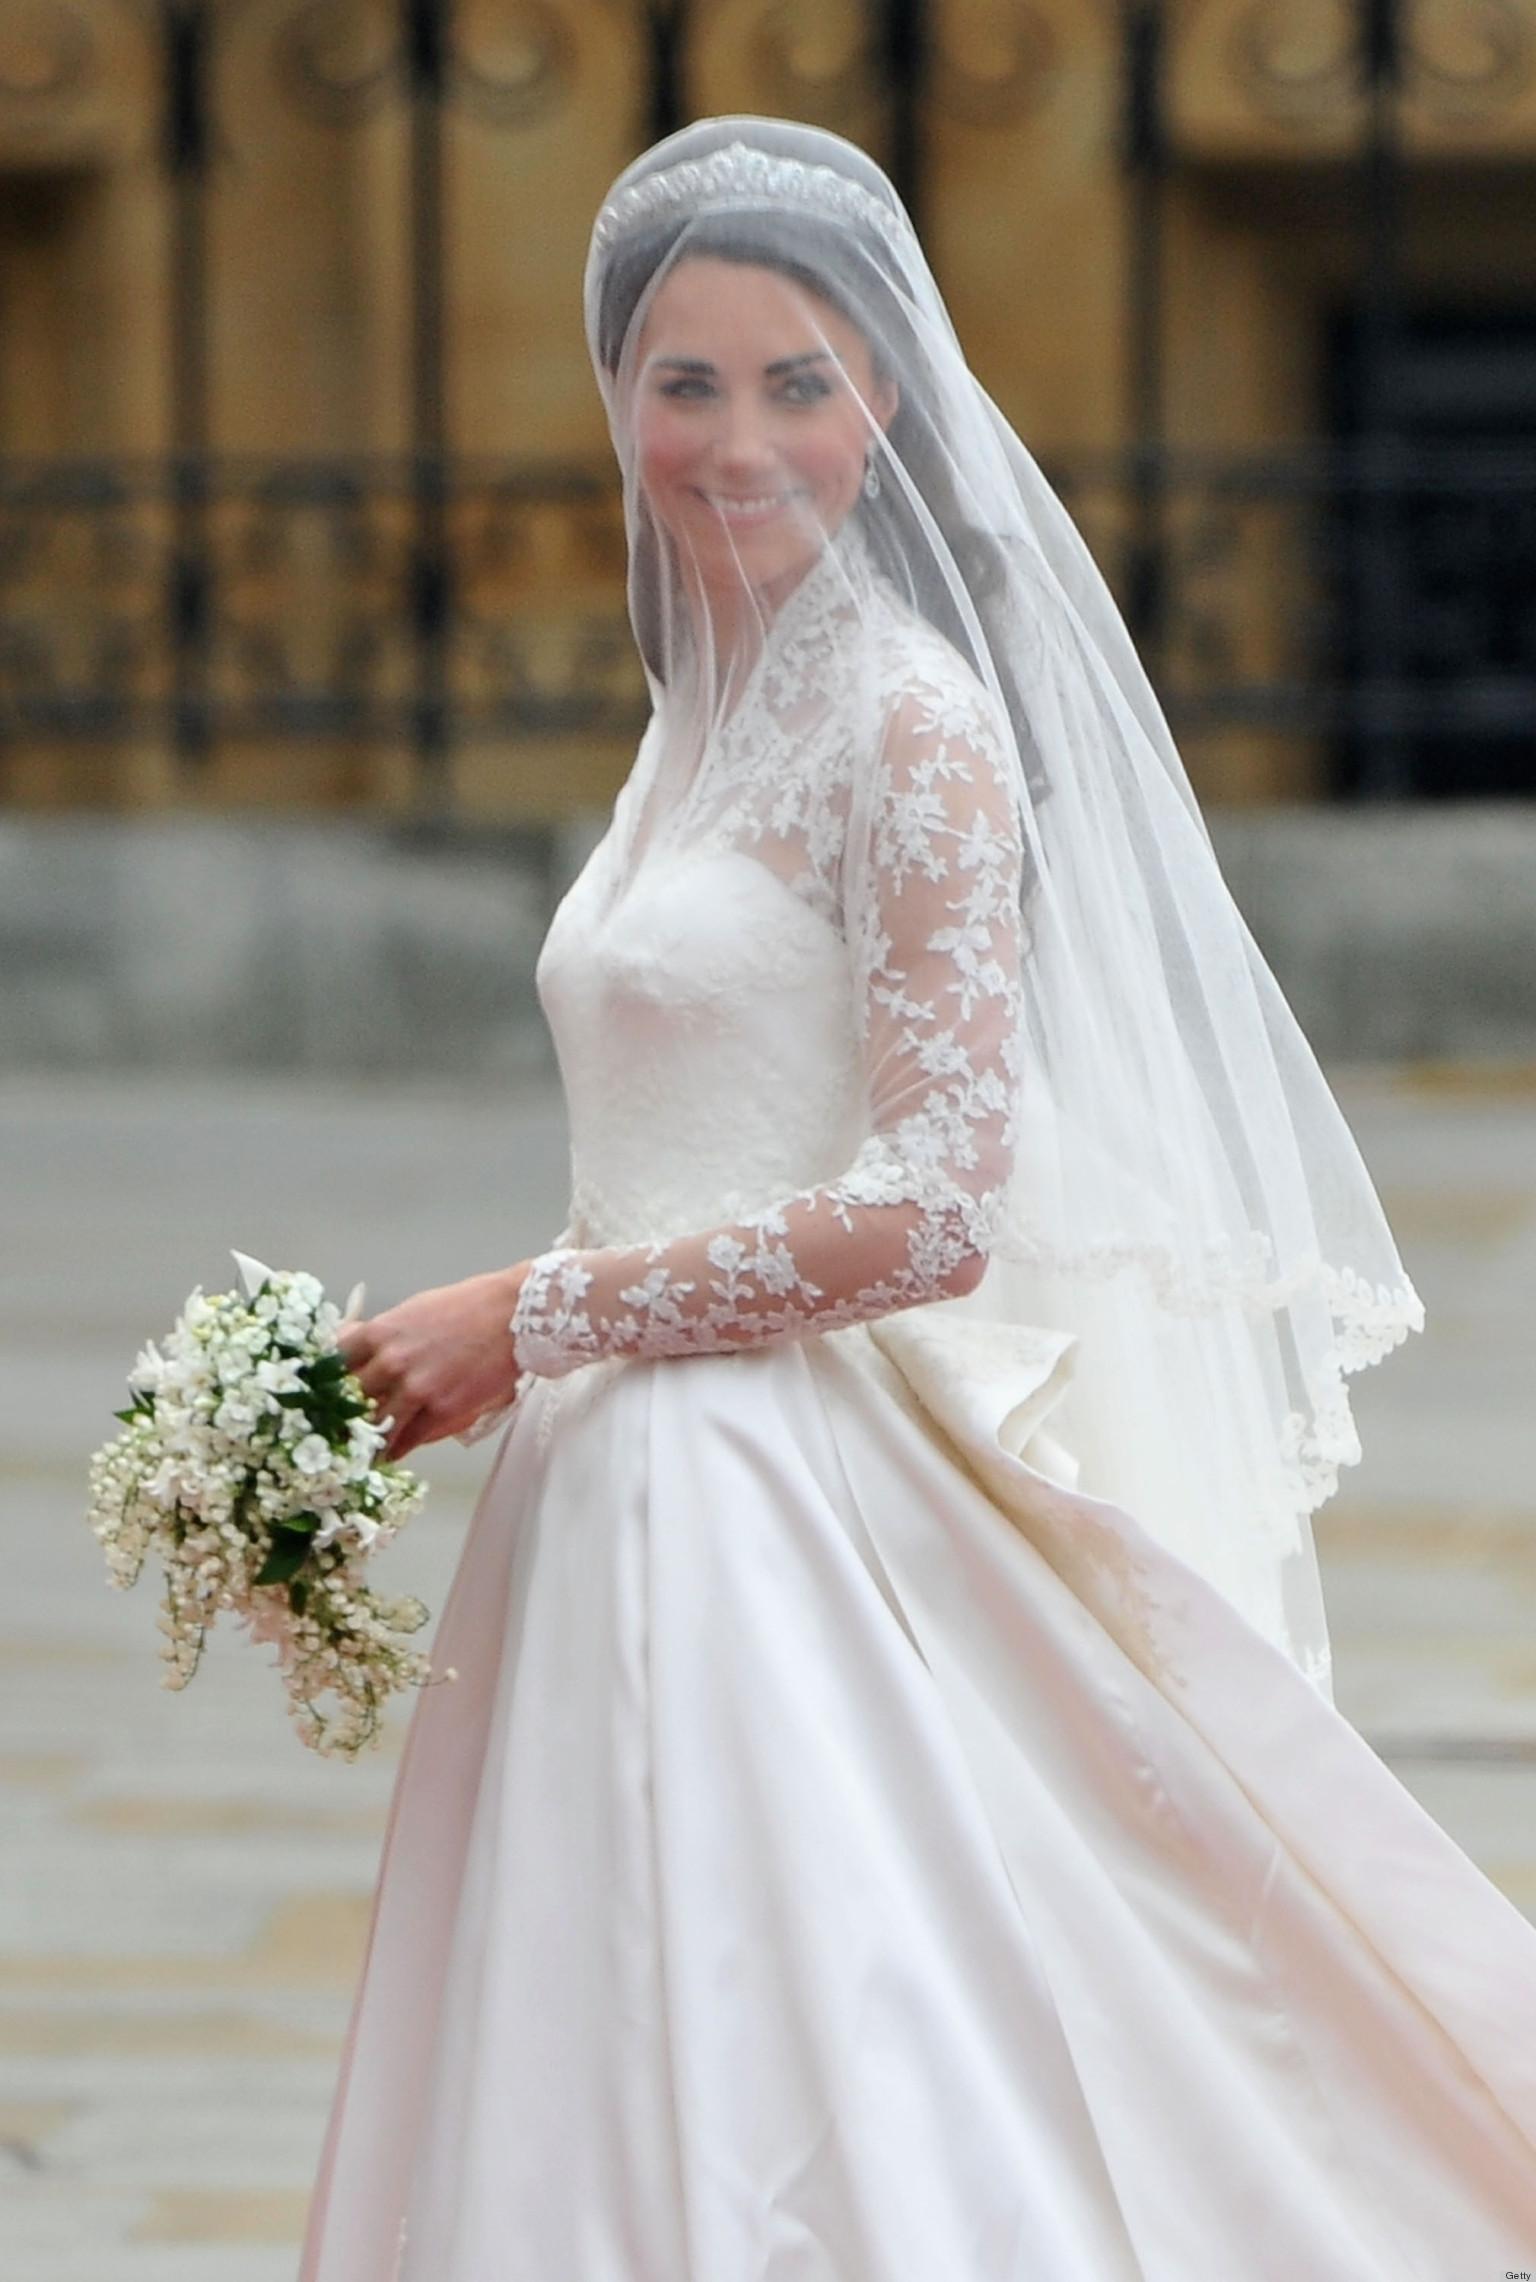 Best Of Wedding Dresses Veils – Wedding